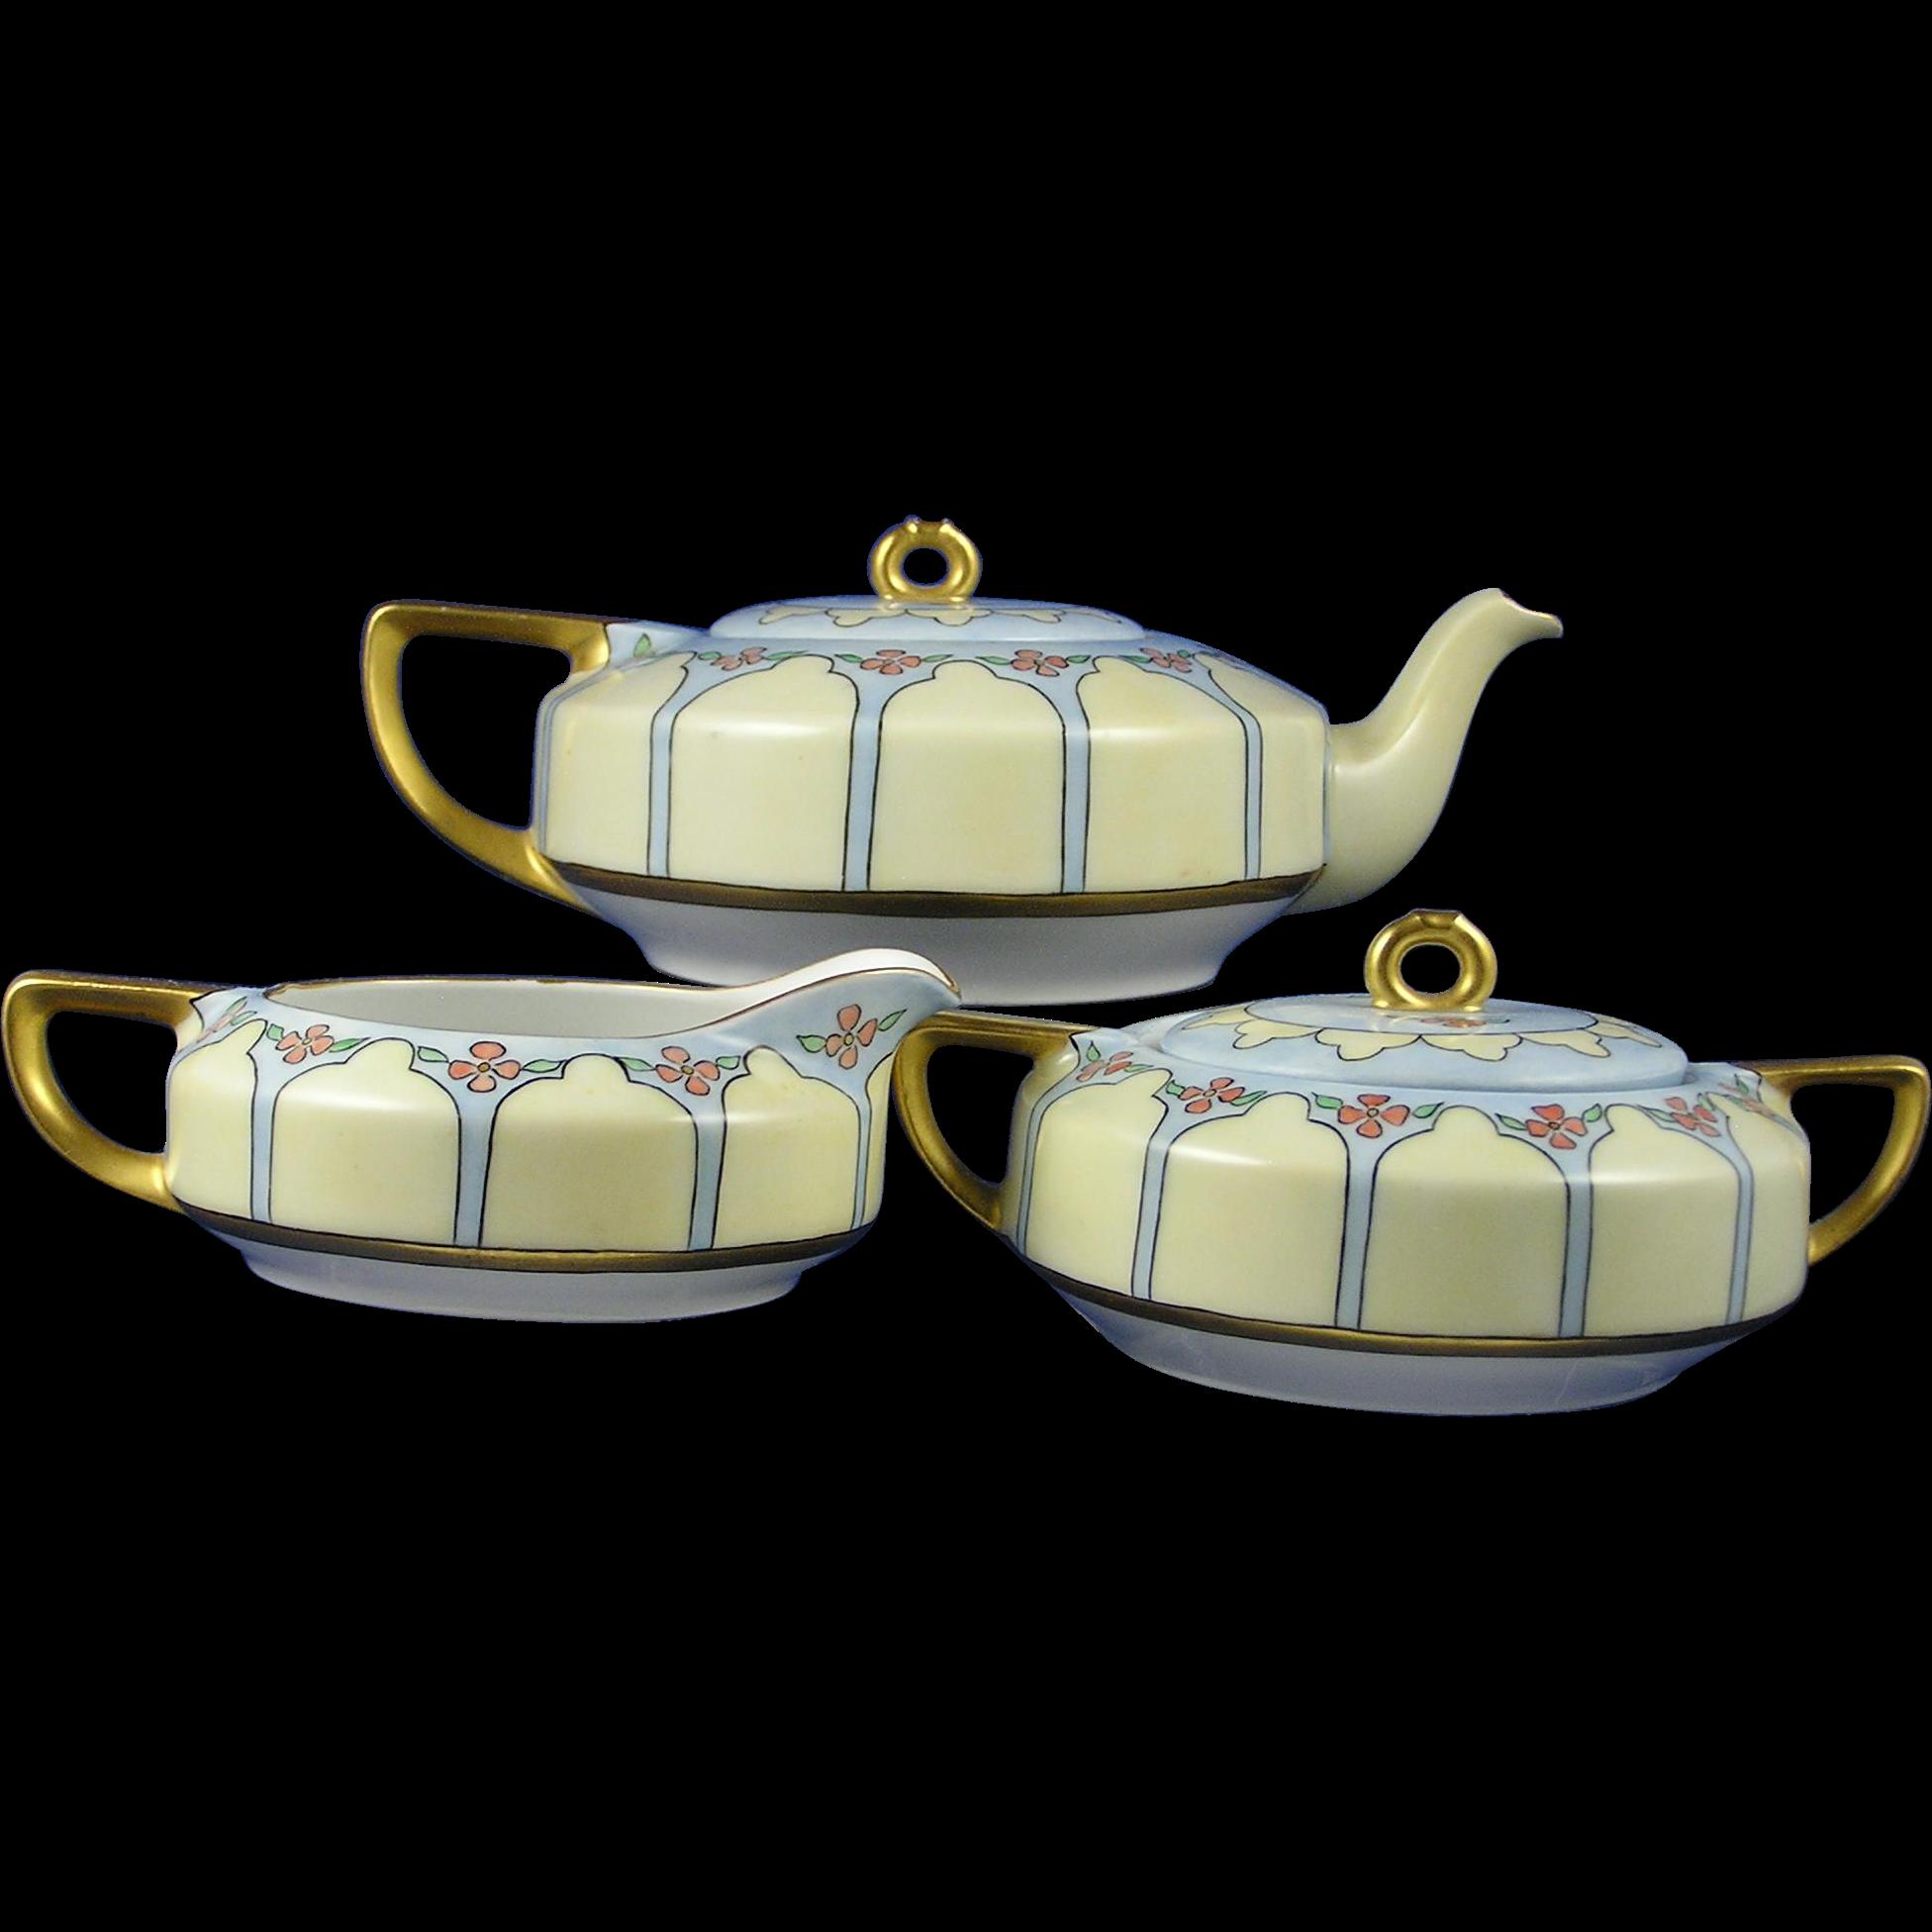 Oscar & Edgar Gutherz (O&EG) Austria Arts & Crafts Floral Motif Teapot, Creamer & Sugar Set (c.1899-1918)